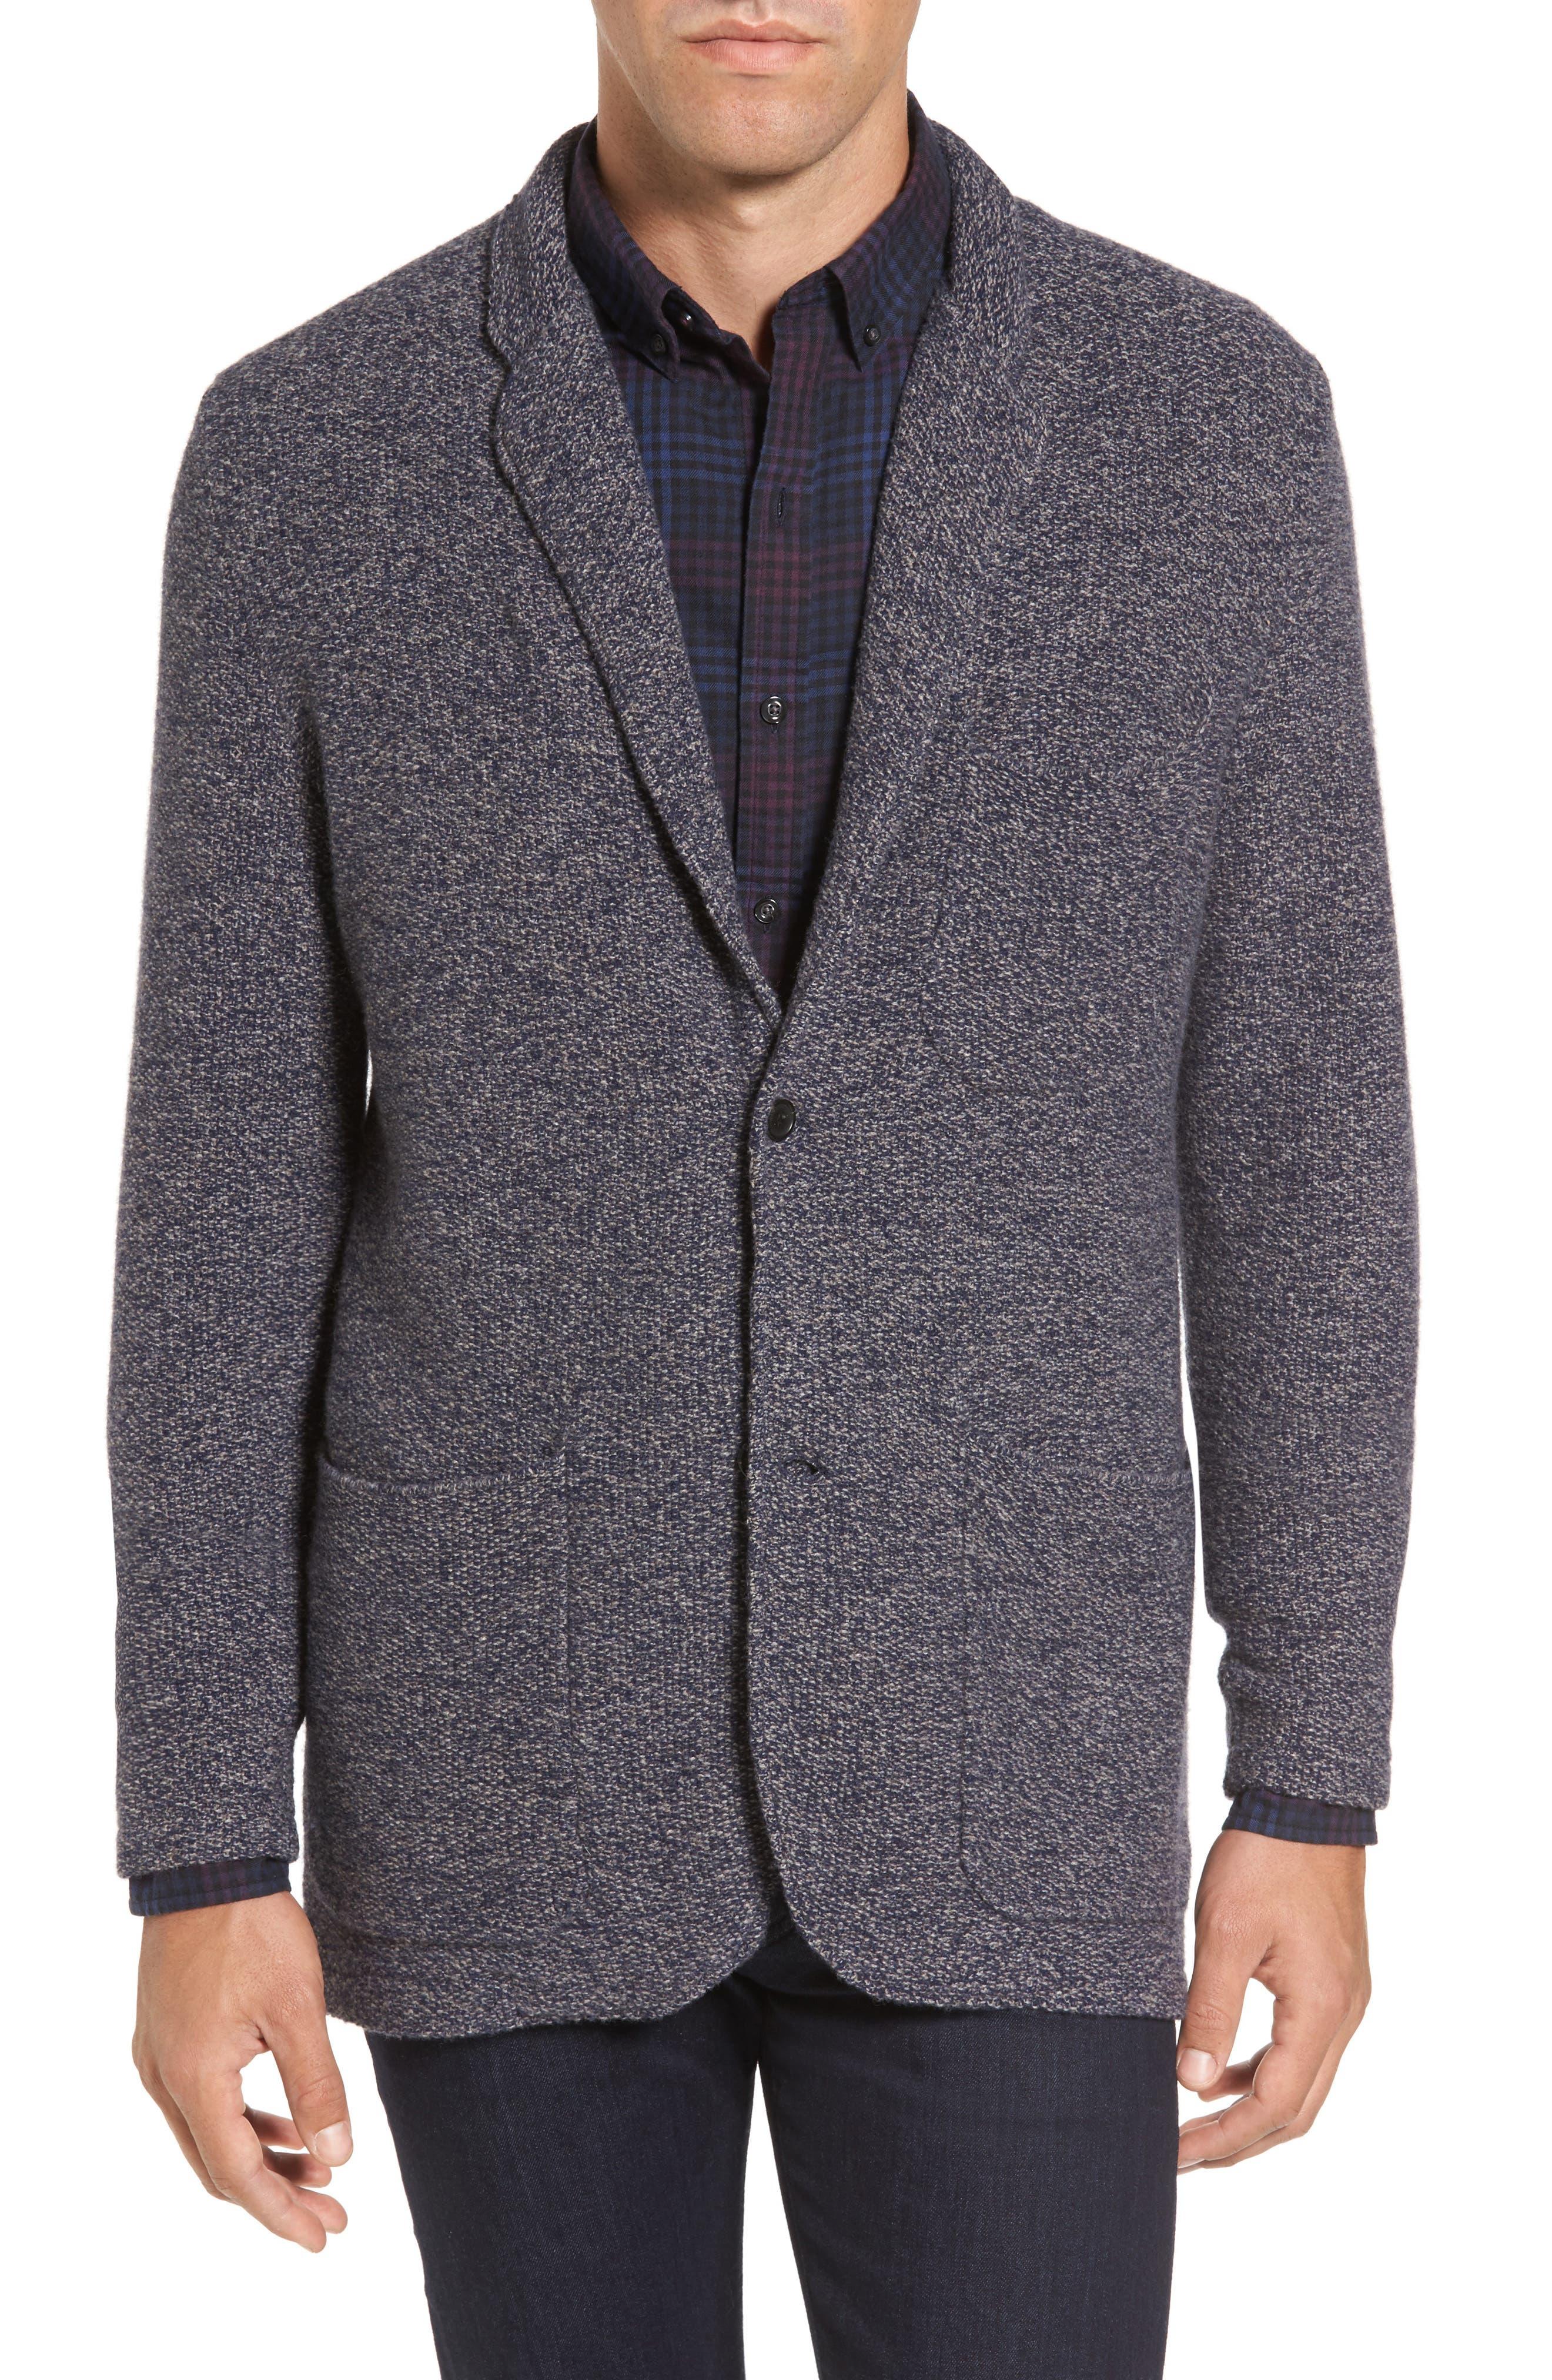 Deconstructed Merino & Yak Wool Sweater Jacket,                             Main thumbnail 1, color,                             416